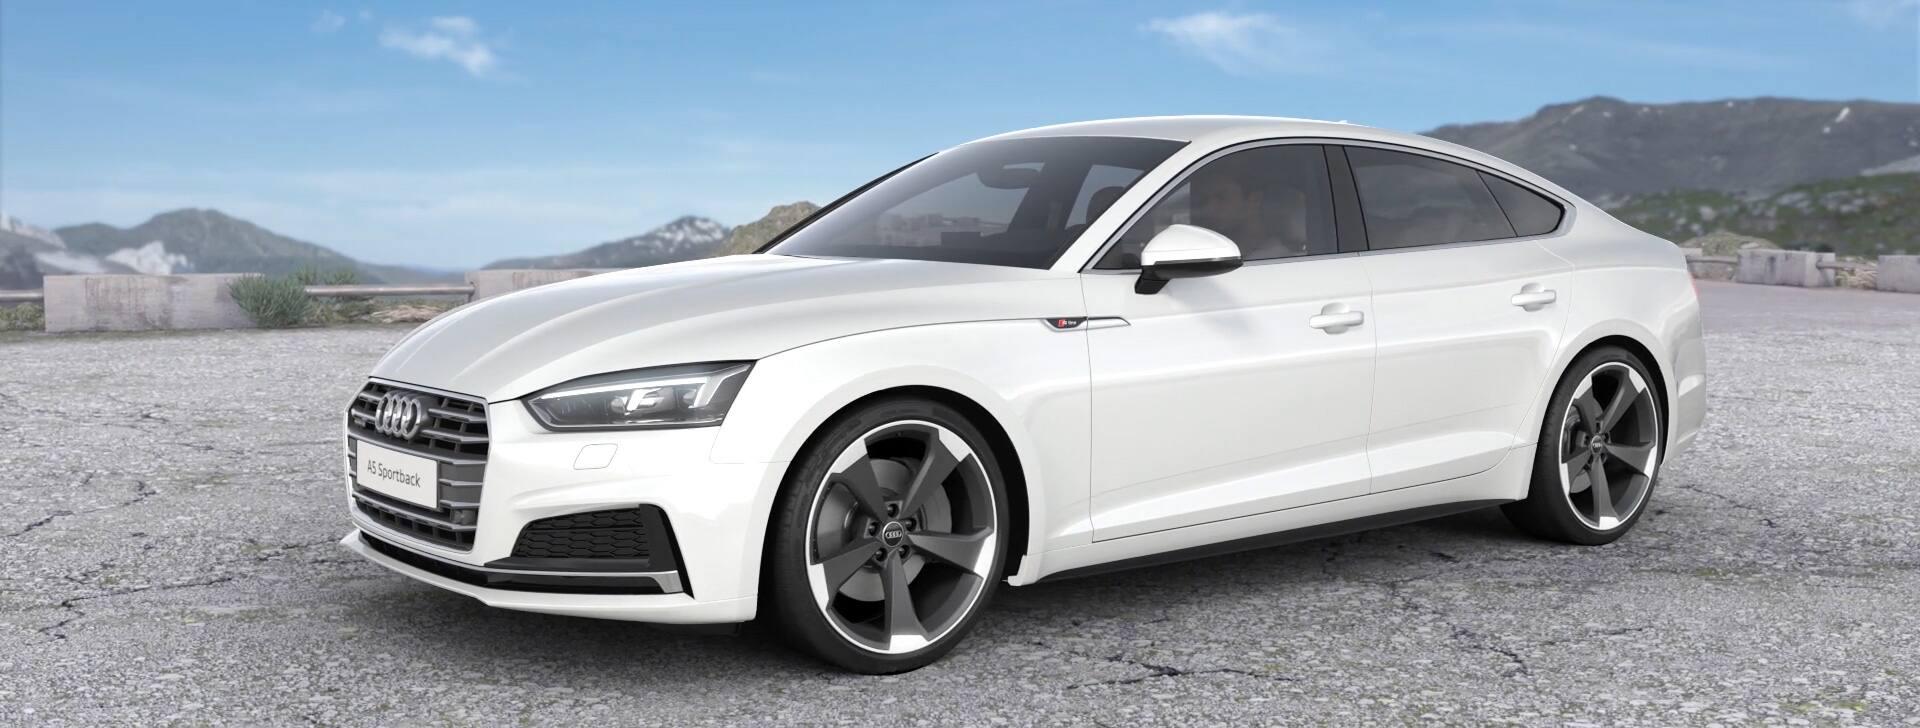 Audi A5 Sportback 2019 Audi A5 Range Audi Dubai